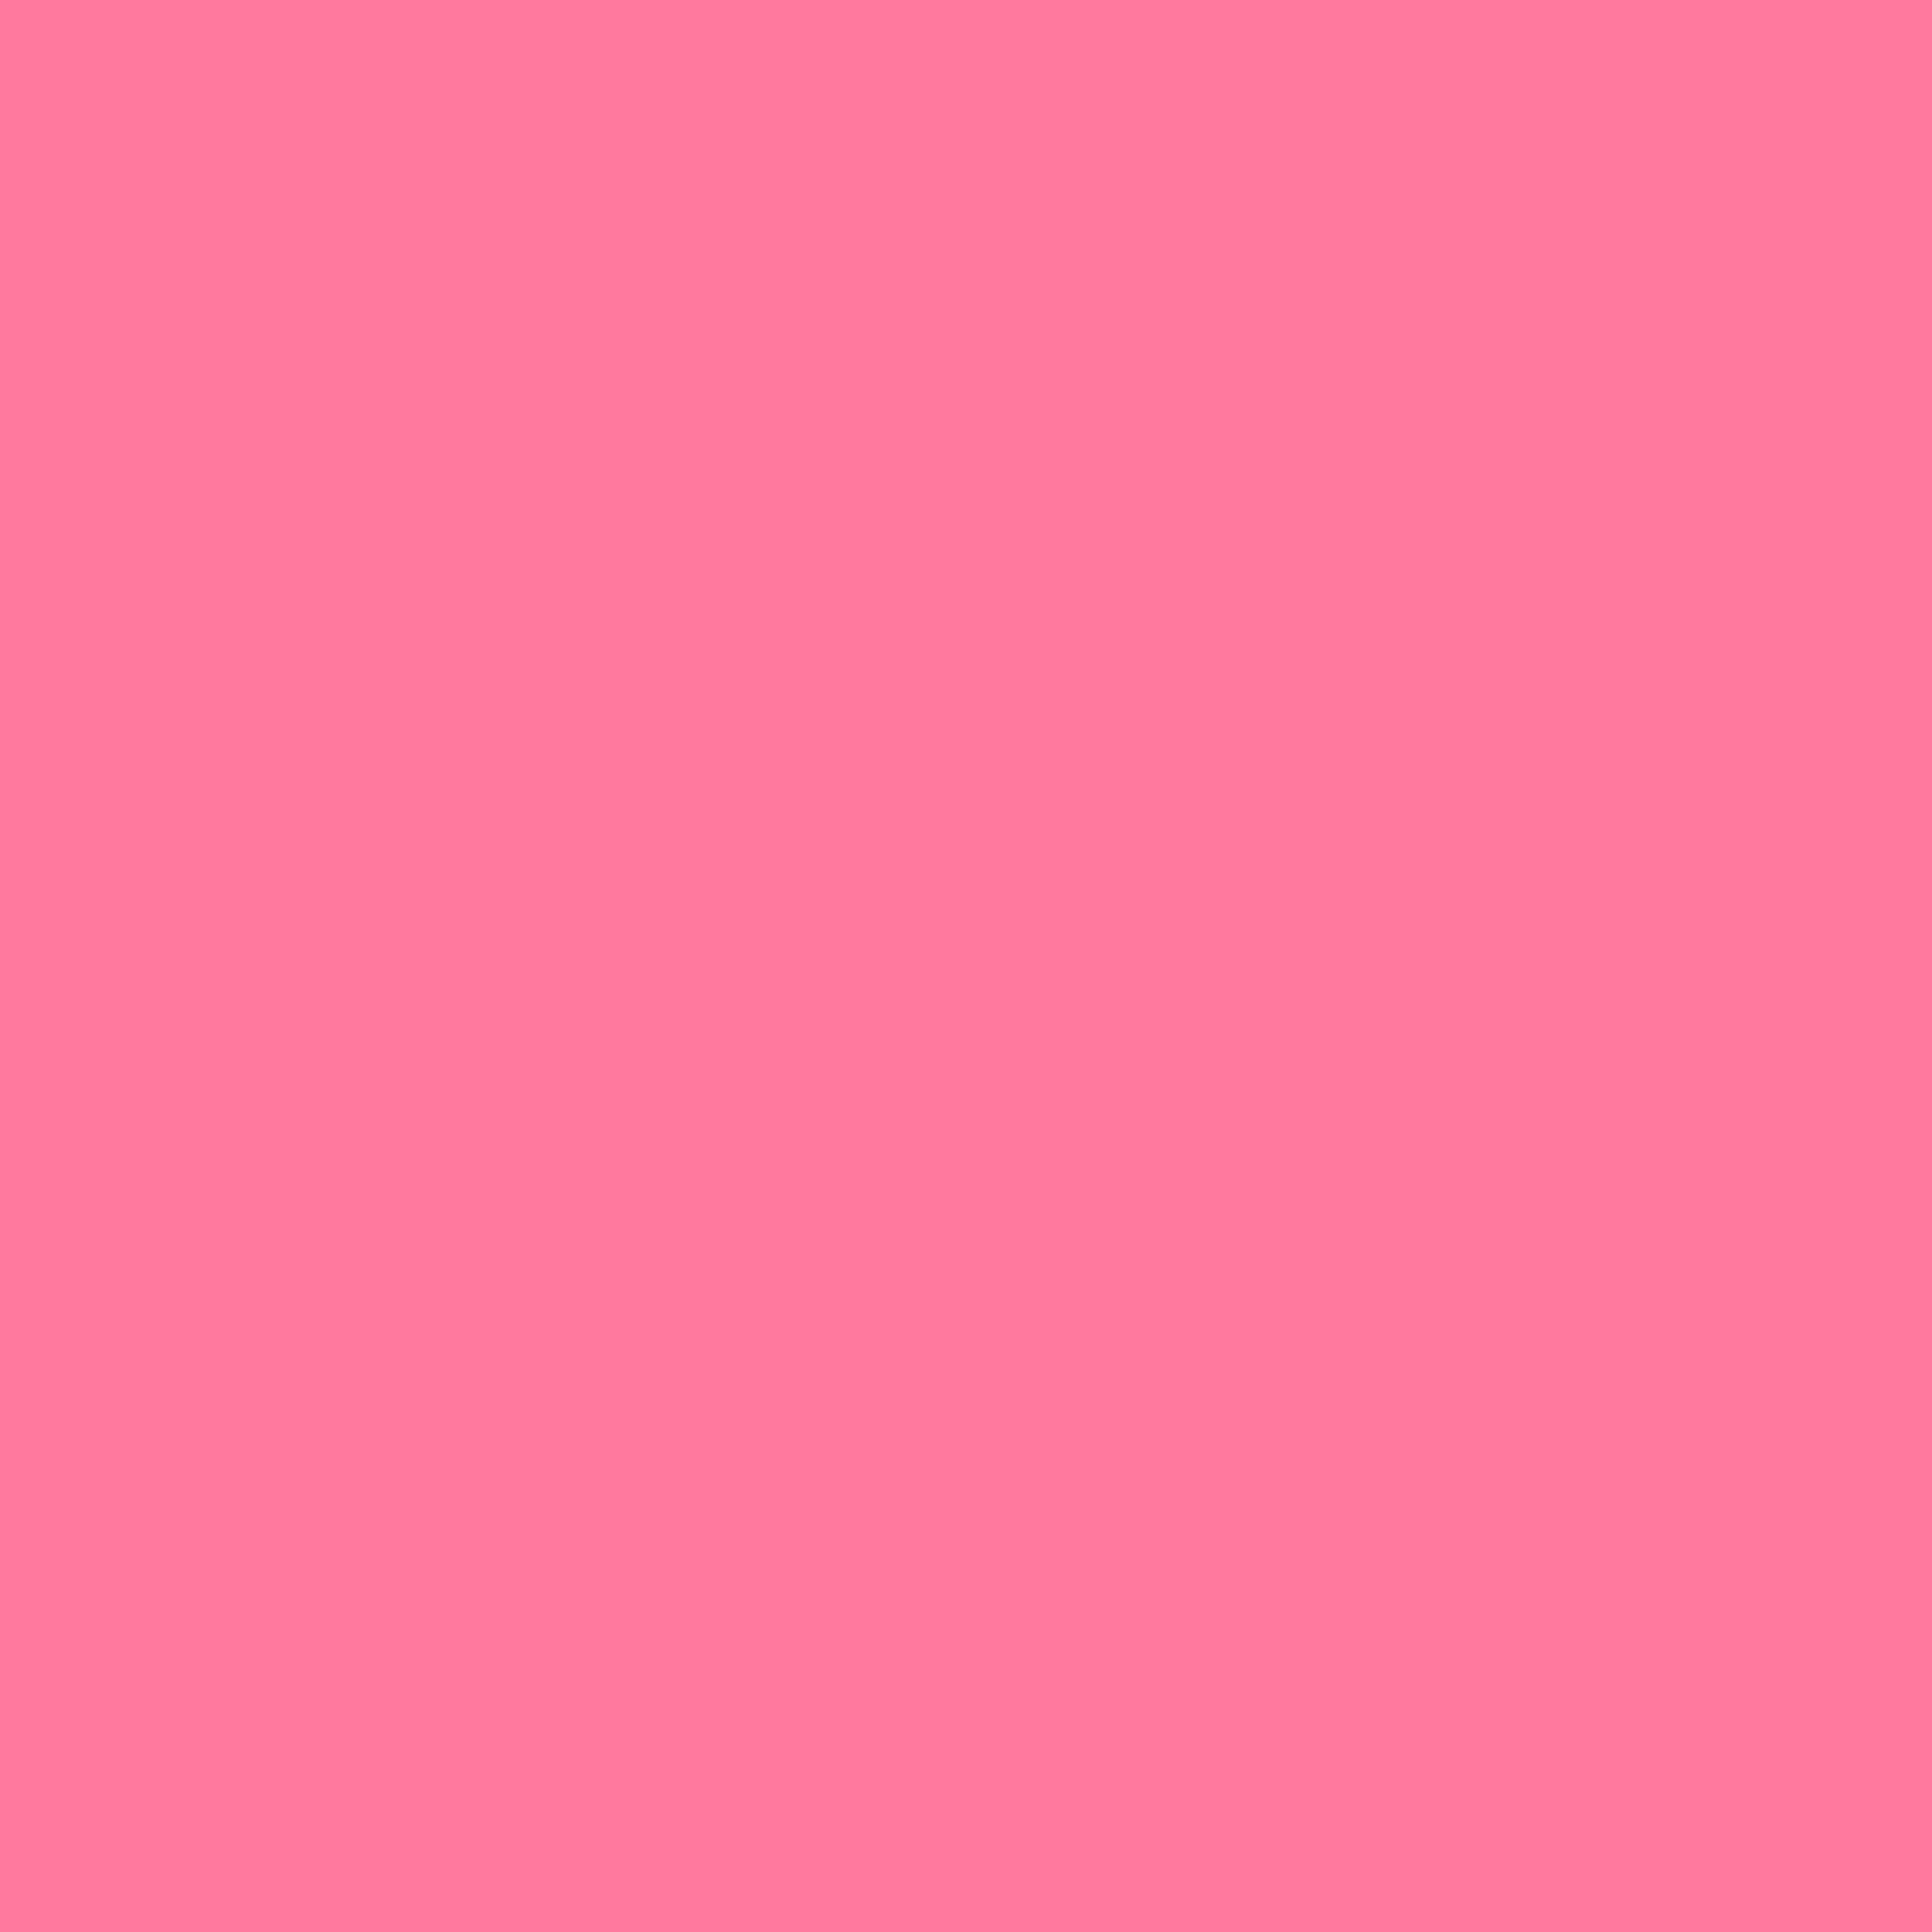 Pink svg #2, Download drawings